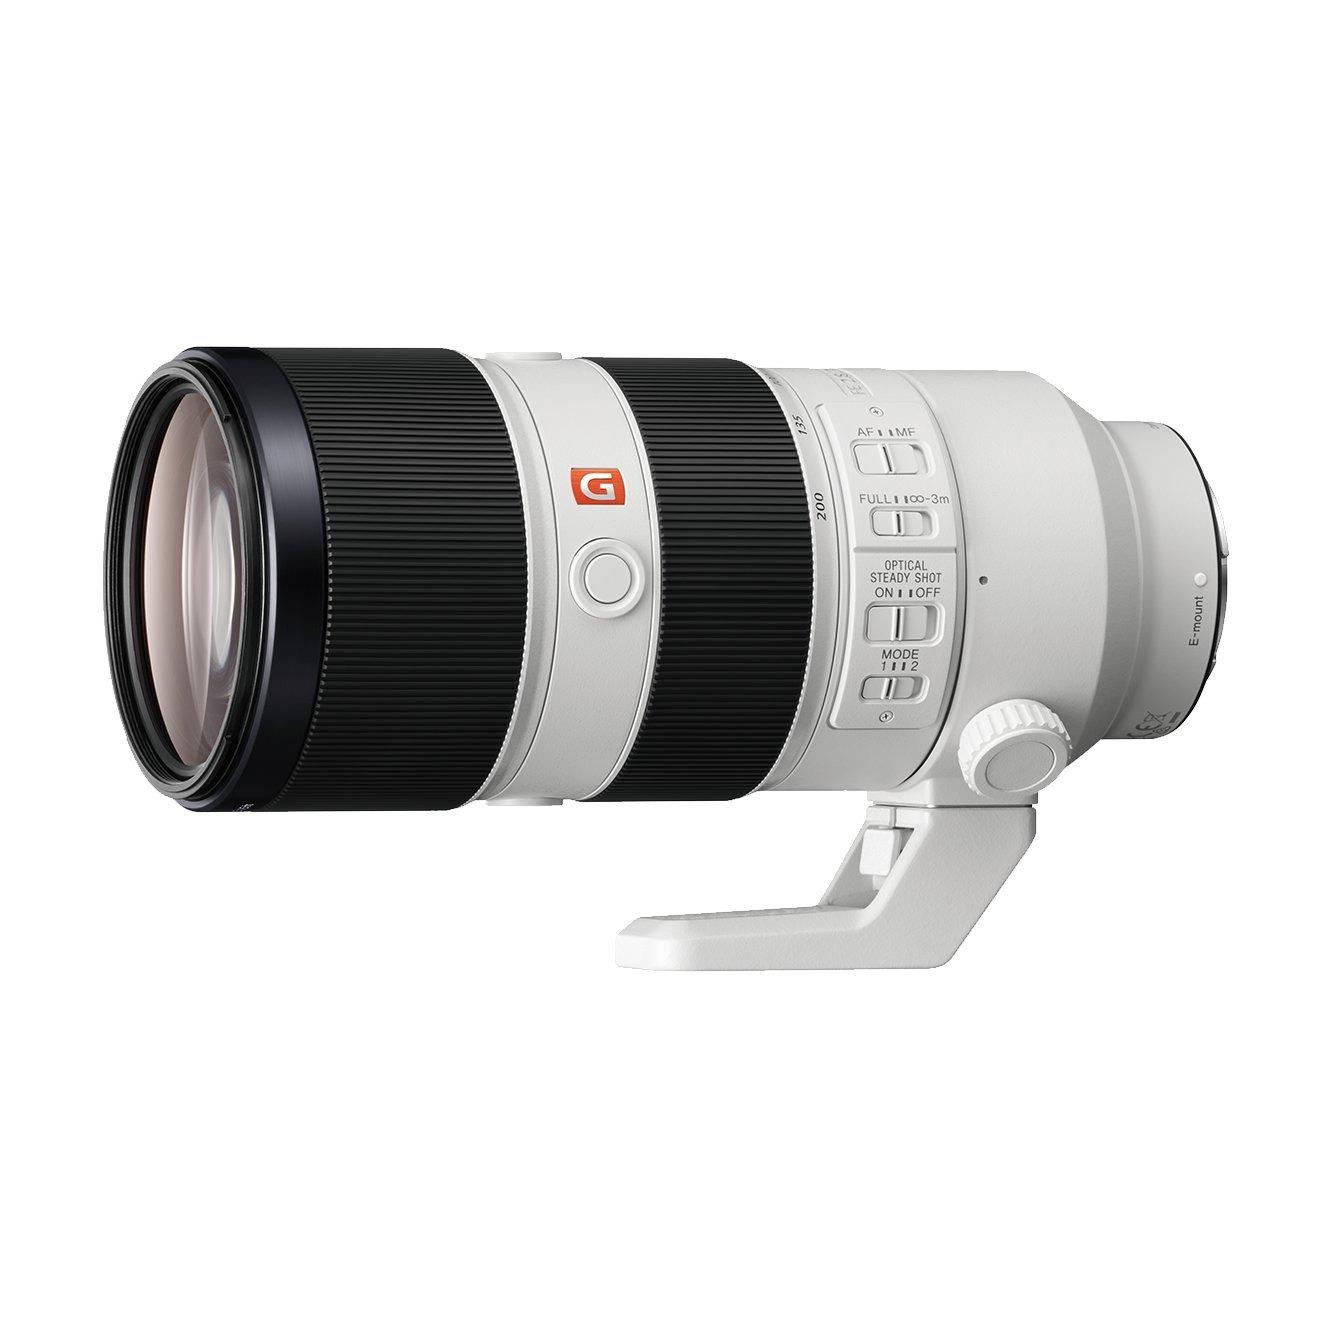 Sony SEL-70200mm GM